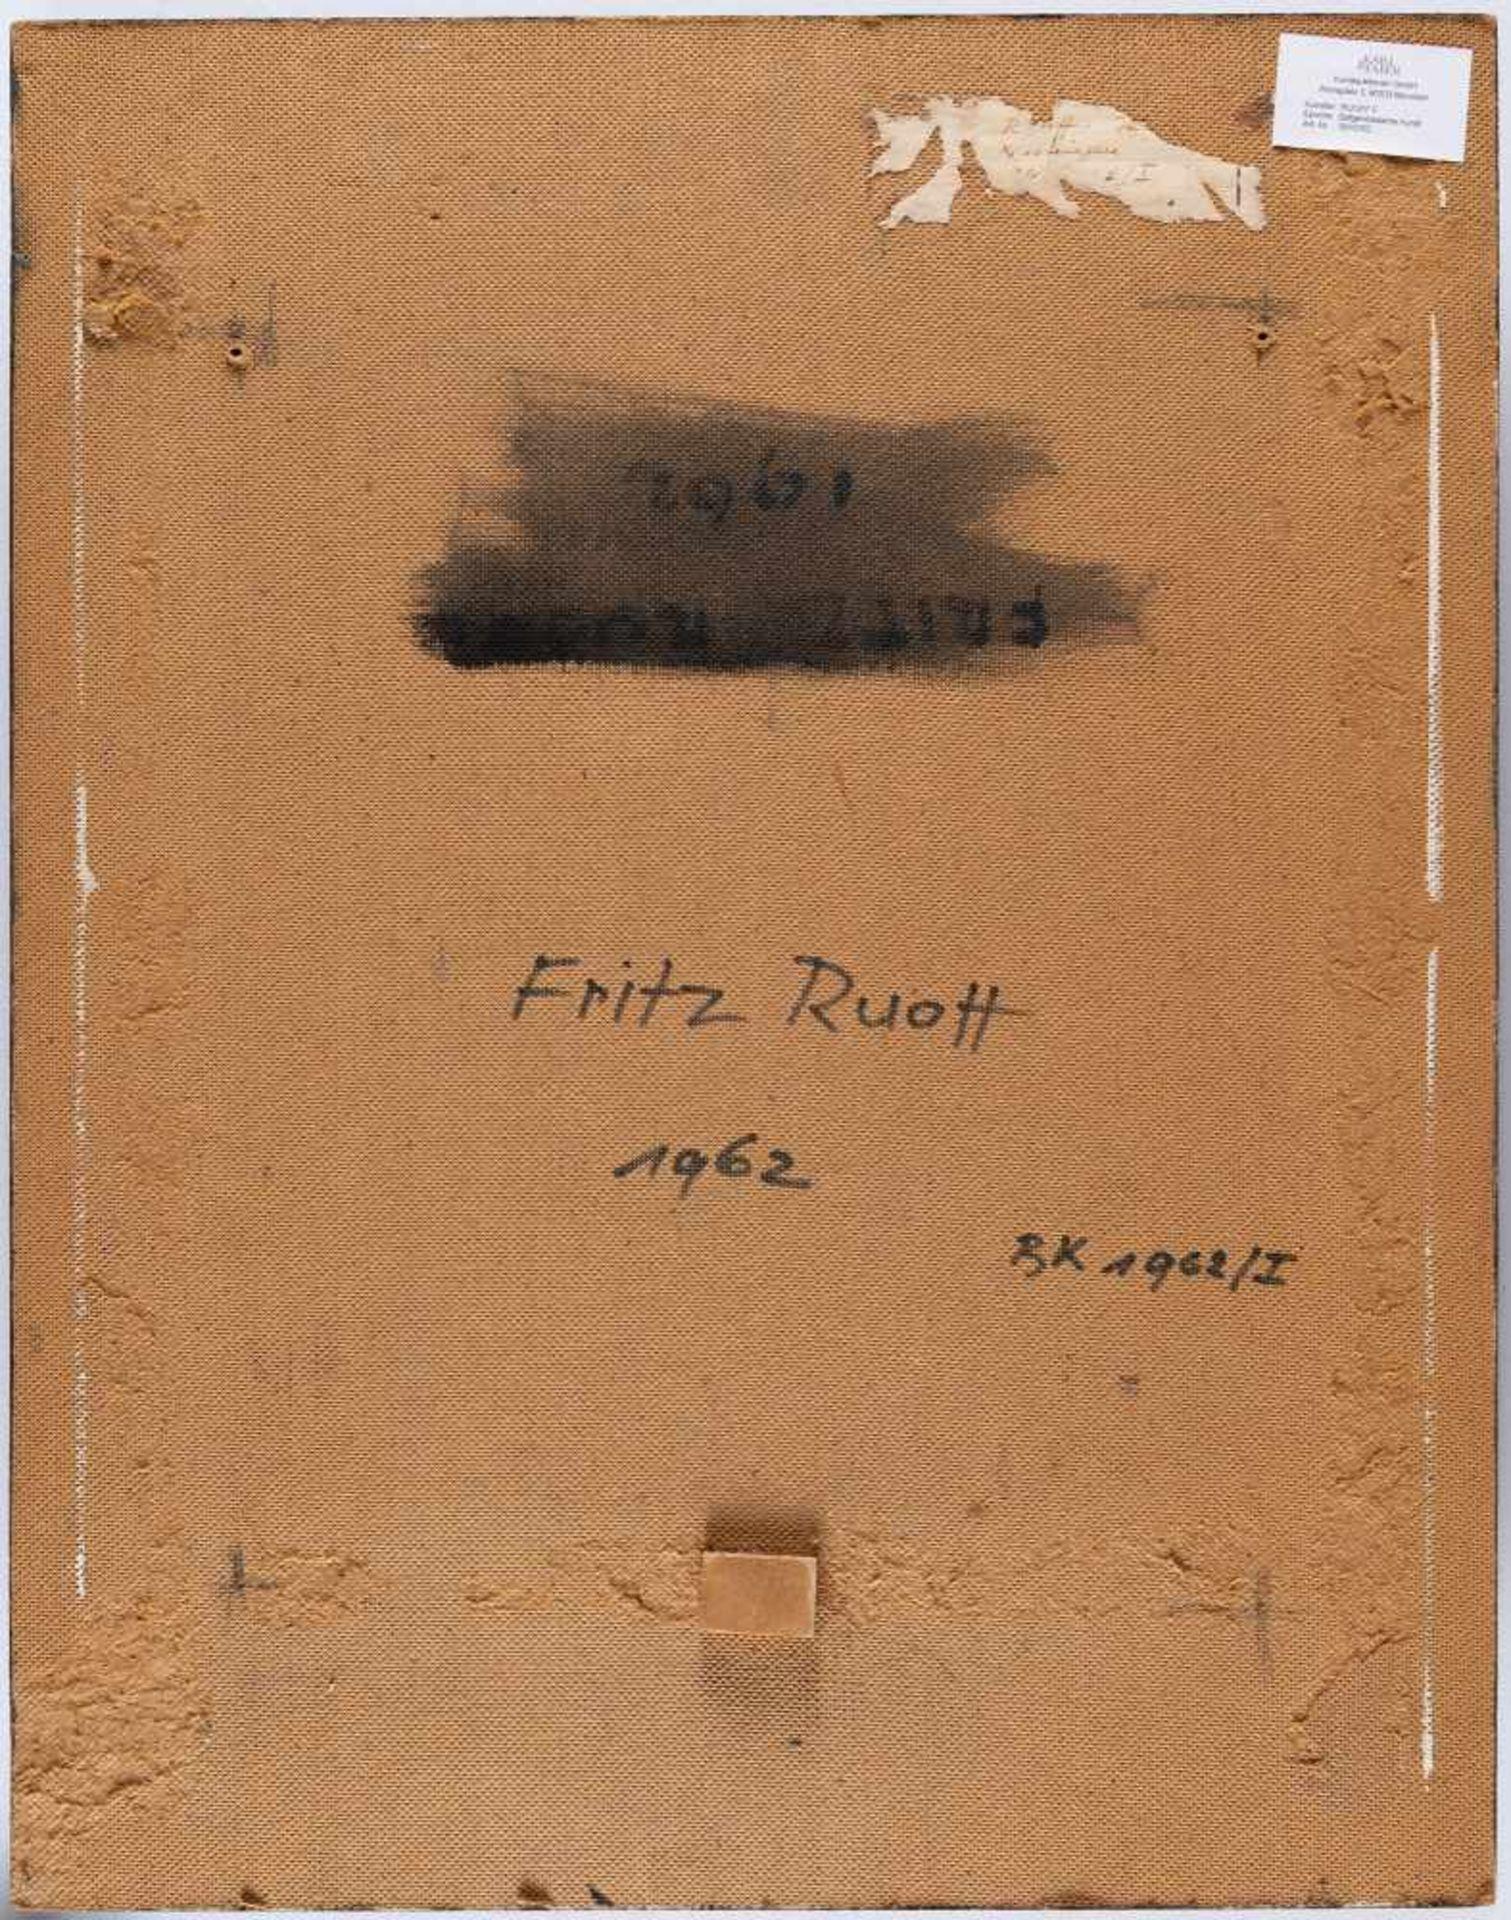 Fritz Ruoff - Bild 3 aus 3